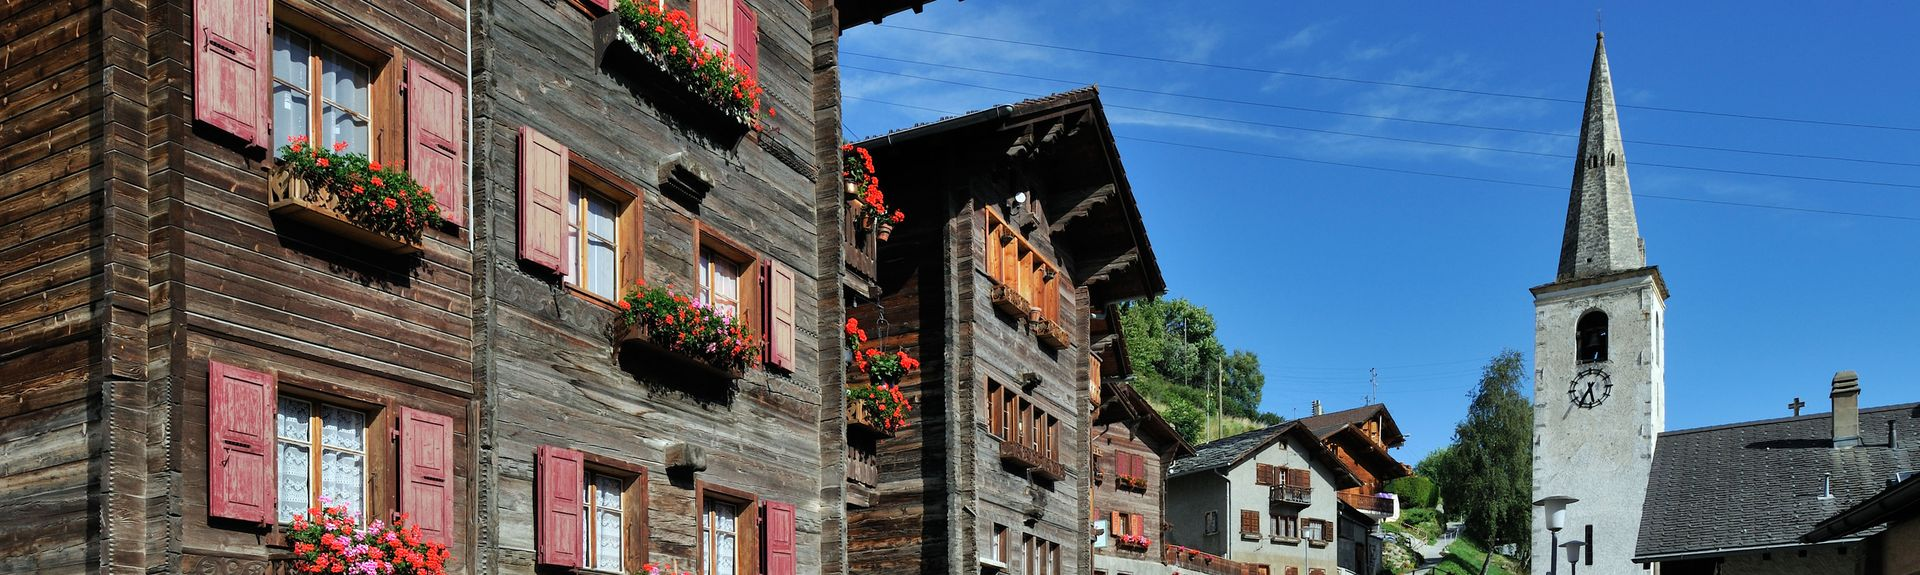 Saint-Martin, Zwitserland